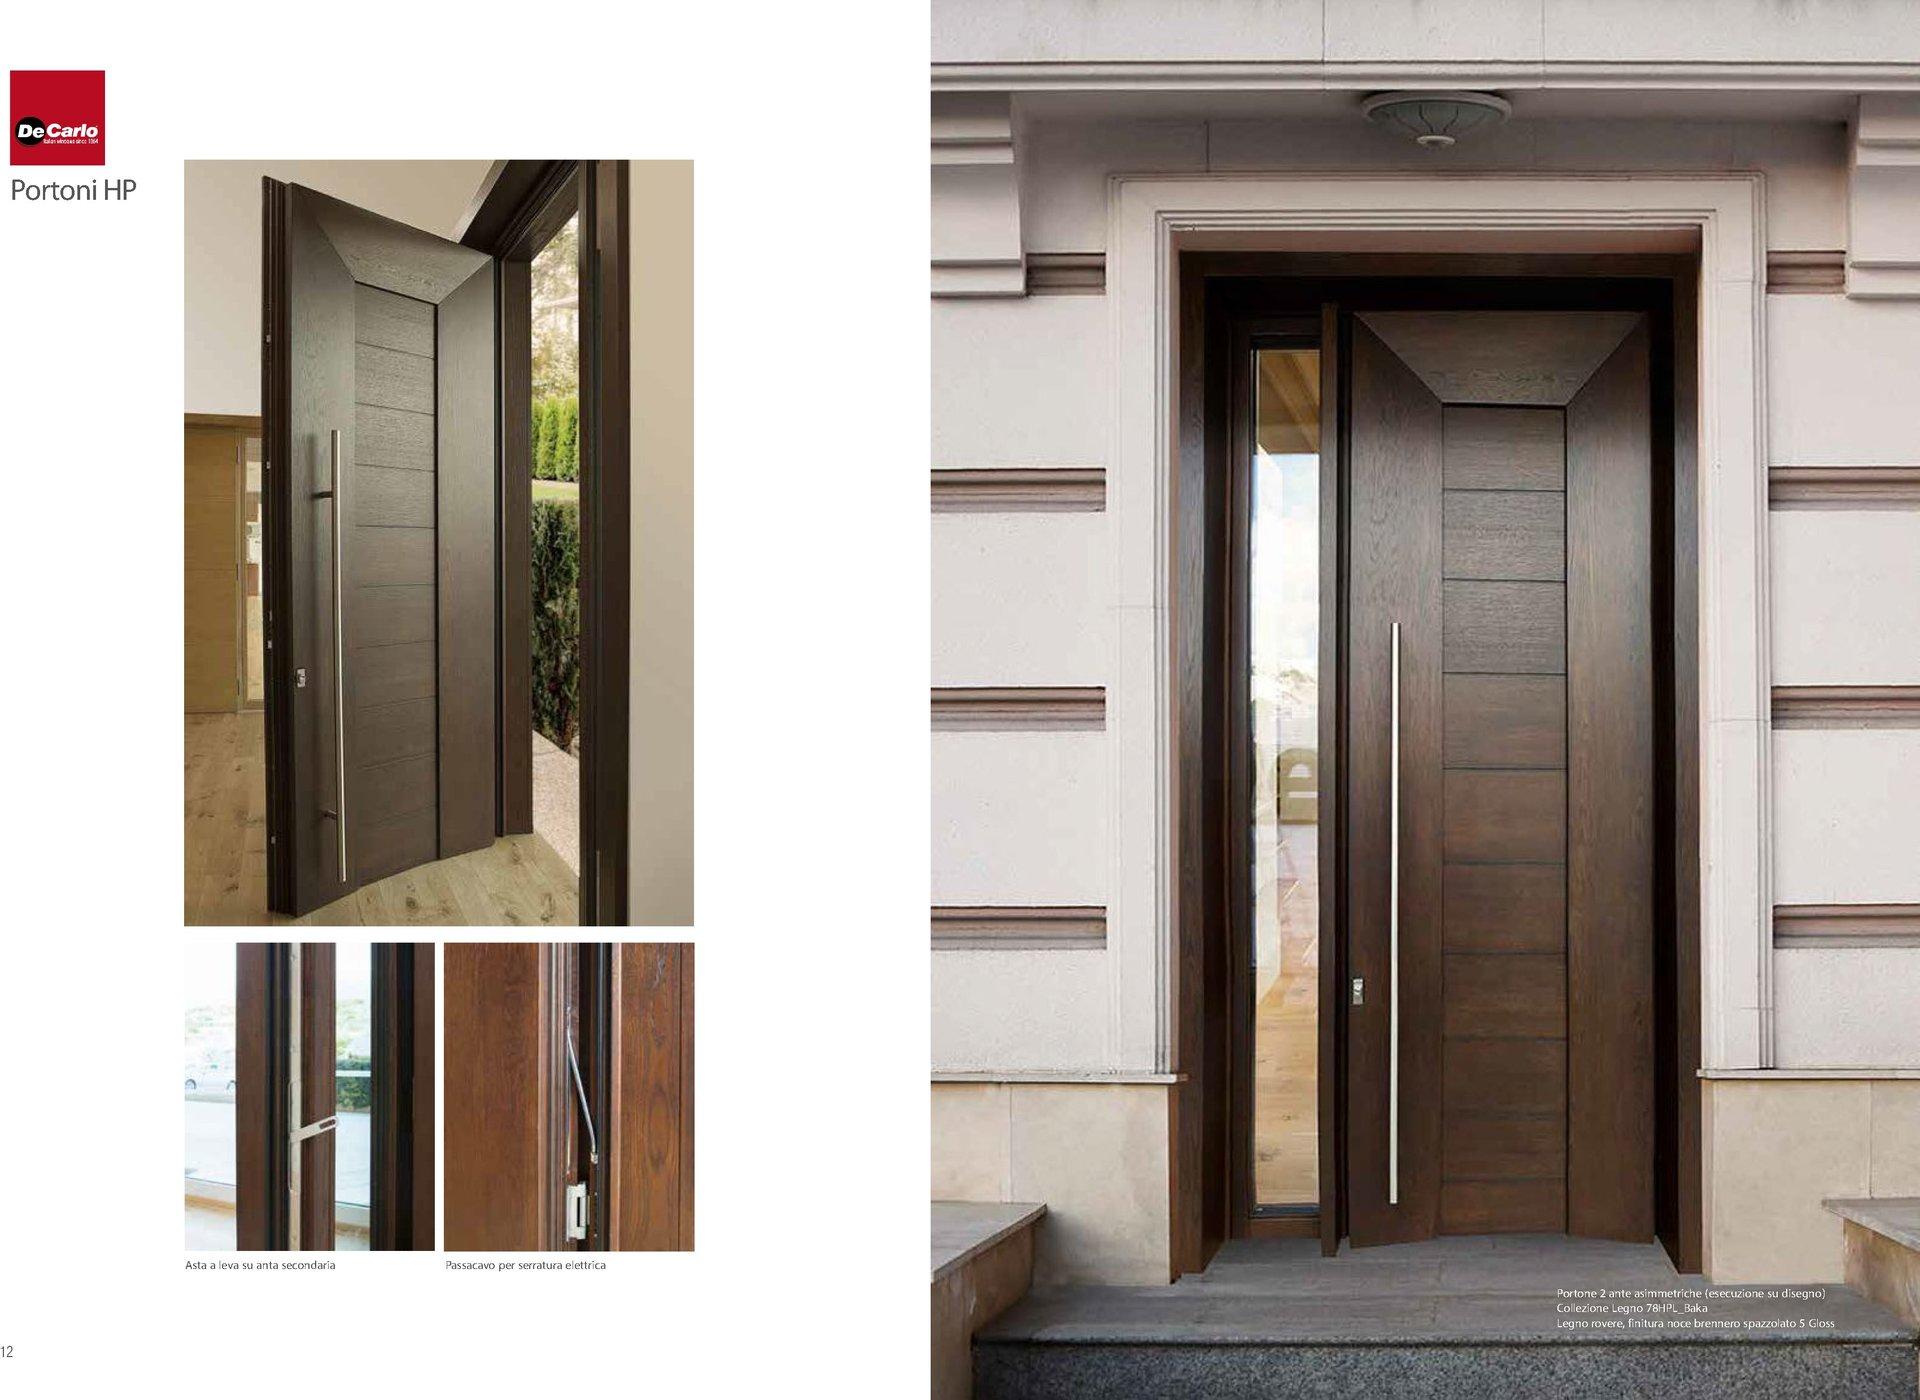 Blindatura porte e portoni caserta ce certe porte sas - Porte interne caserta ...